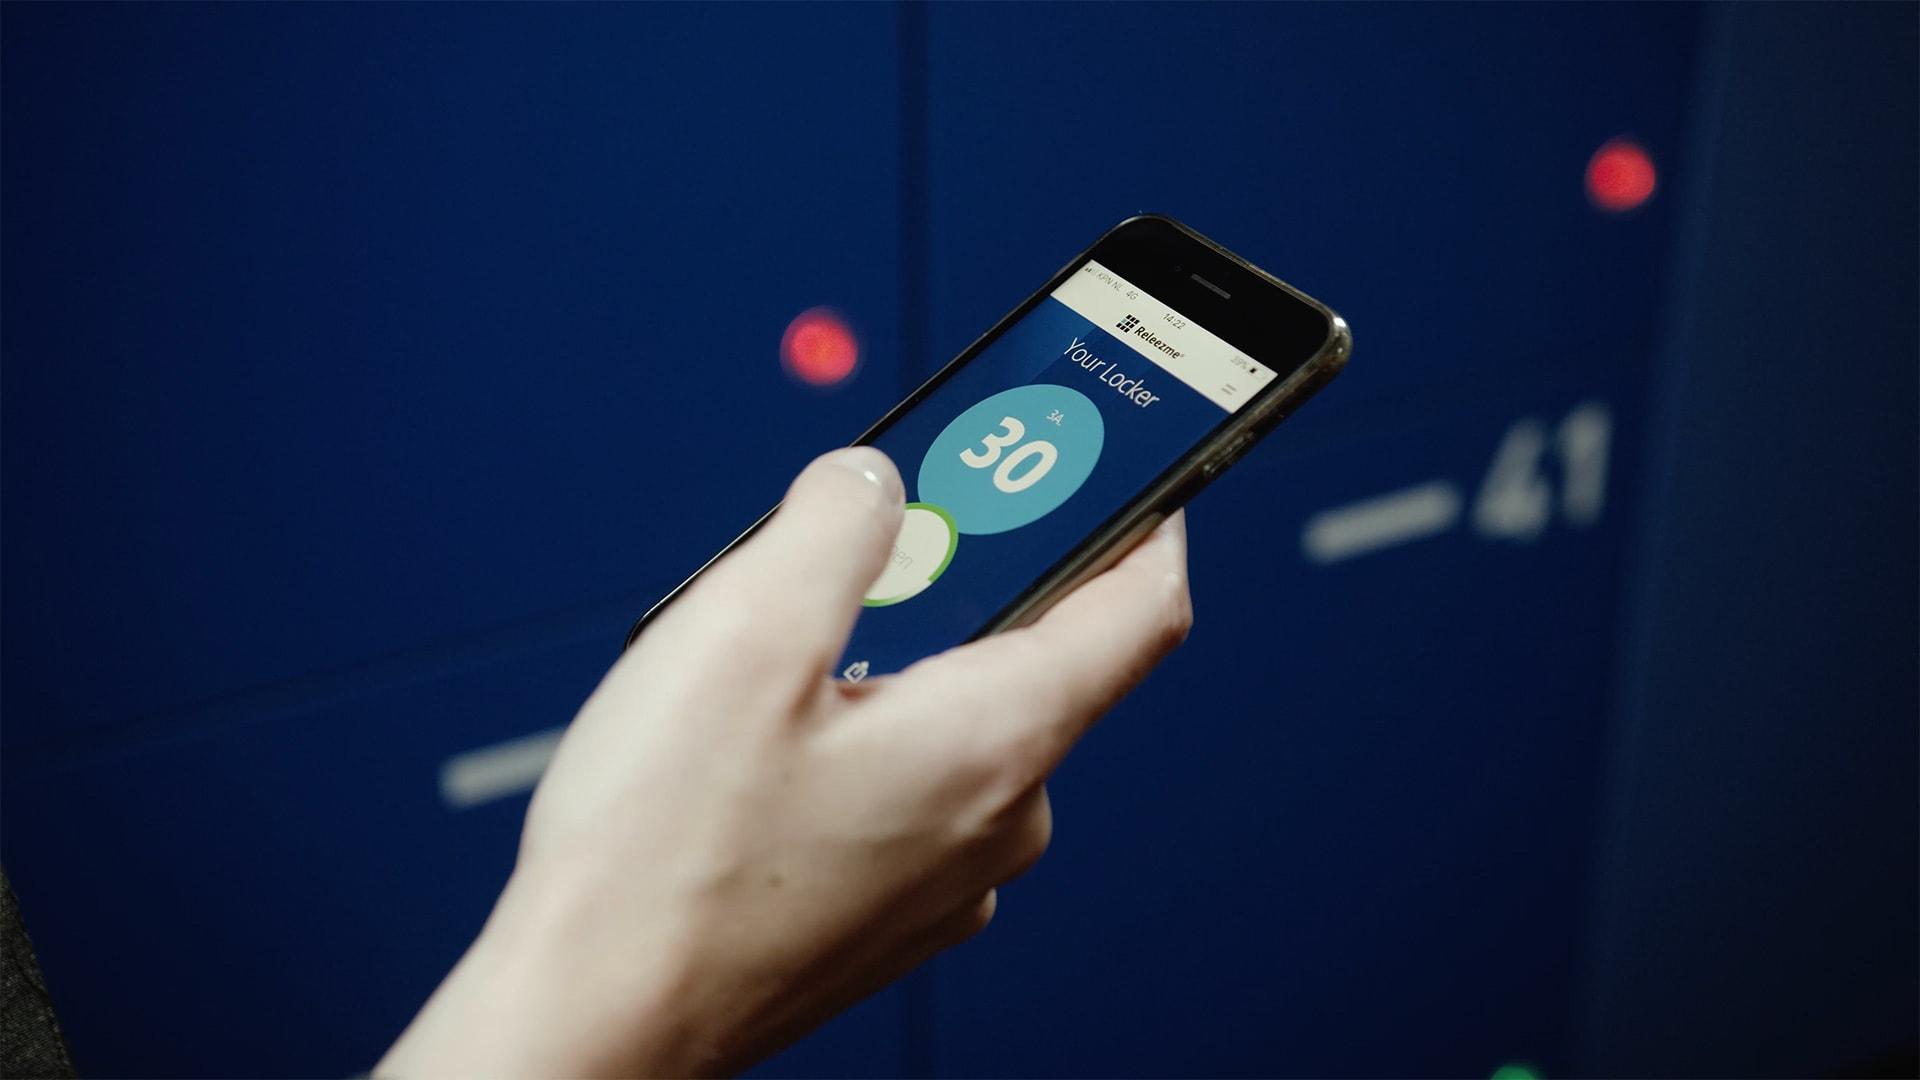 vecos smart locker lady holding smartphone to open storage locker